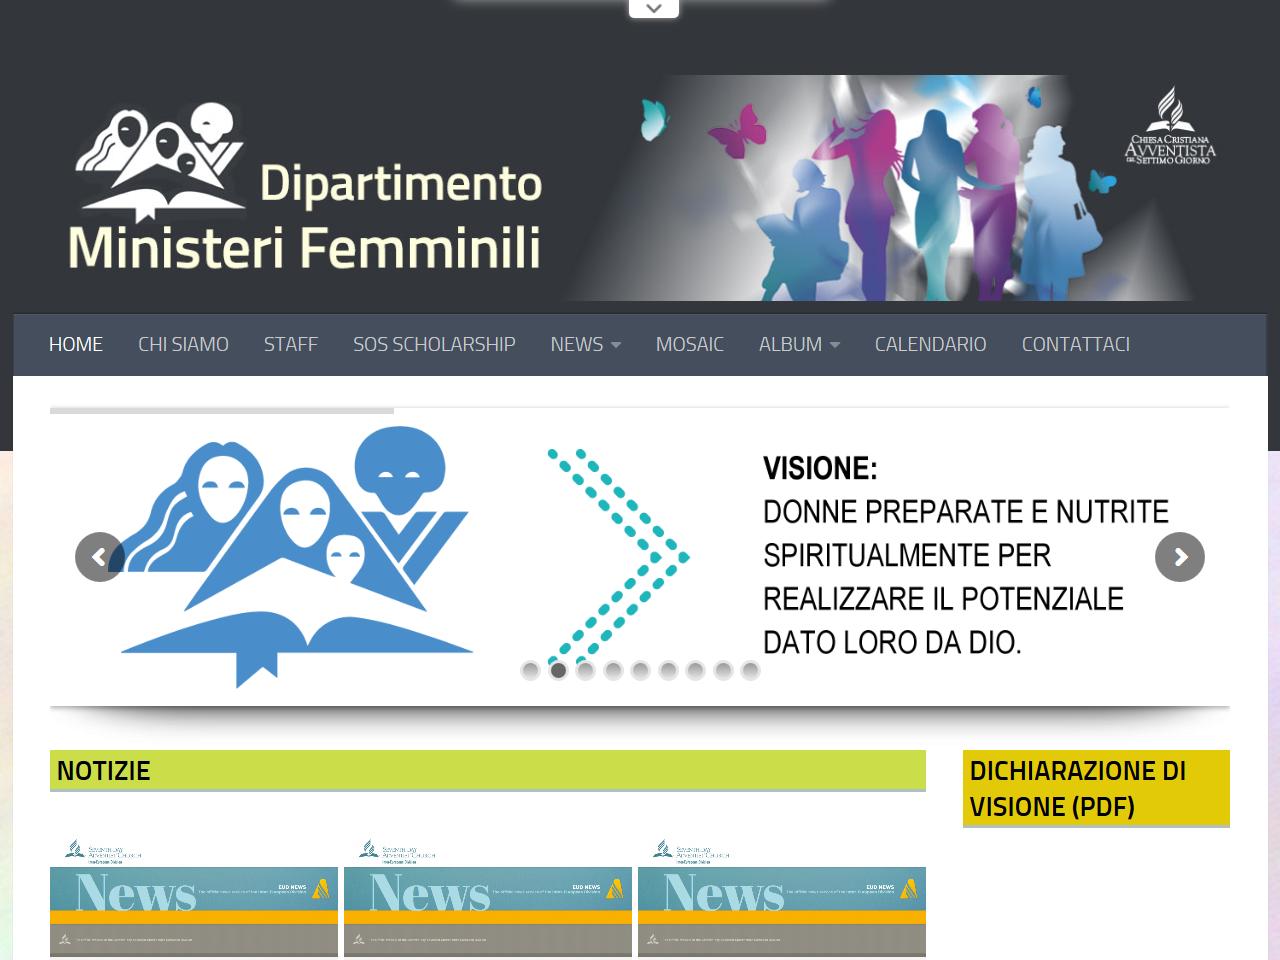 Ministeri Femminili